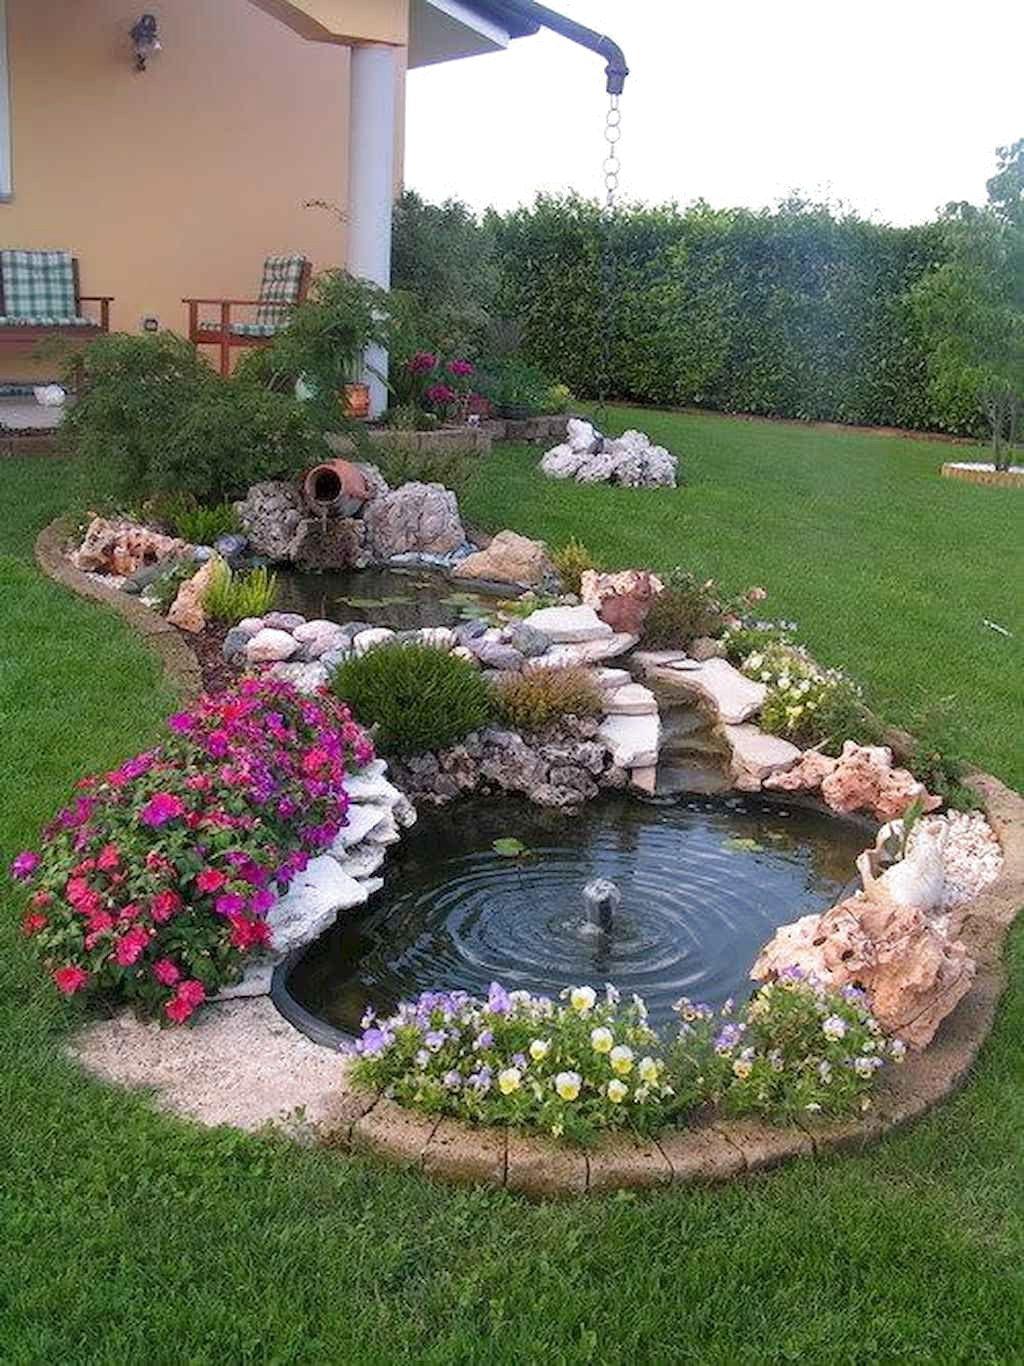 56 Backyard Ponds And Water Garden Landscaping Ideas Home Garden Waterfalls Backyard Backyard Garden Landscape Ponds Backyard